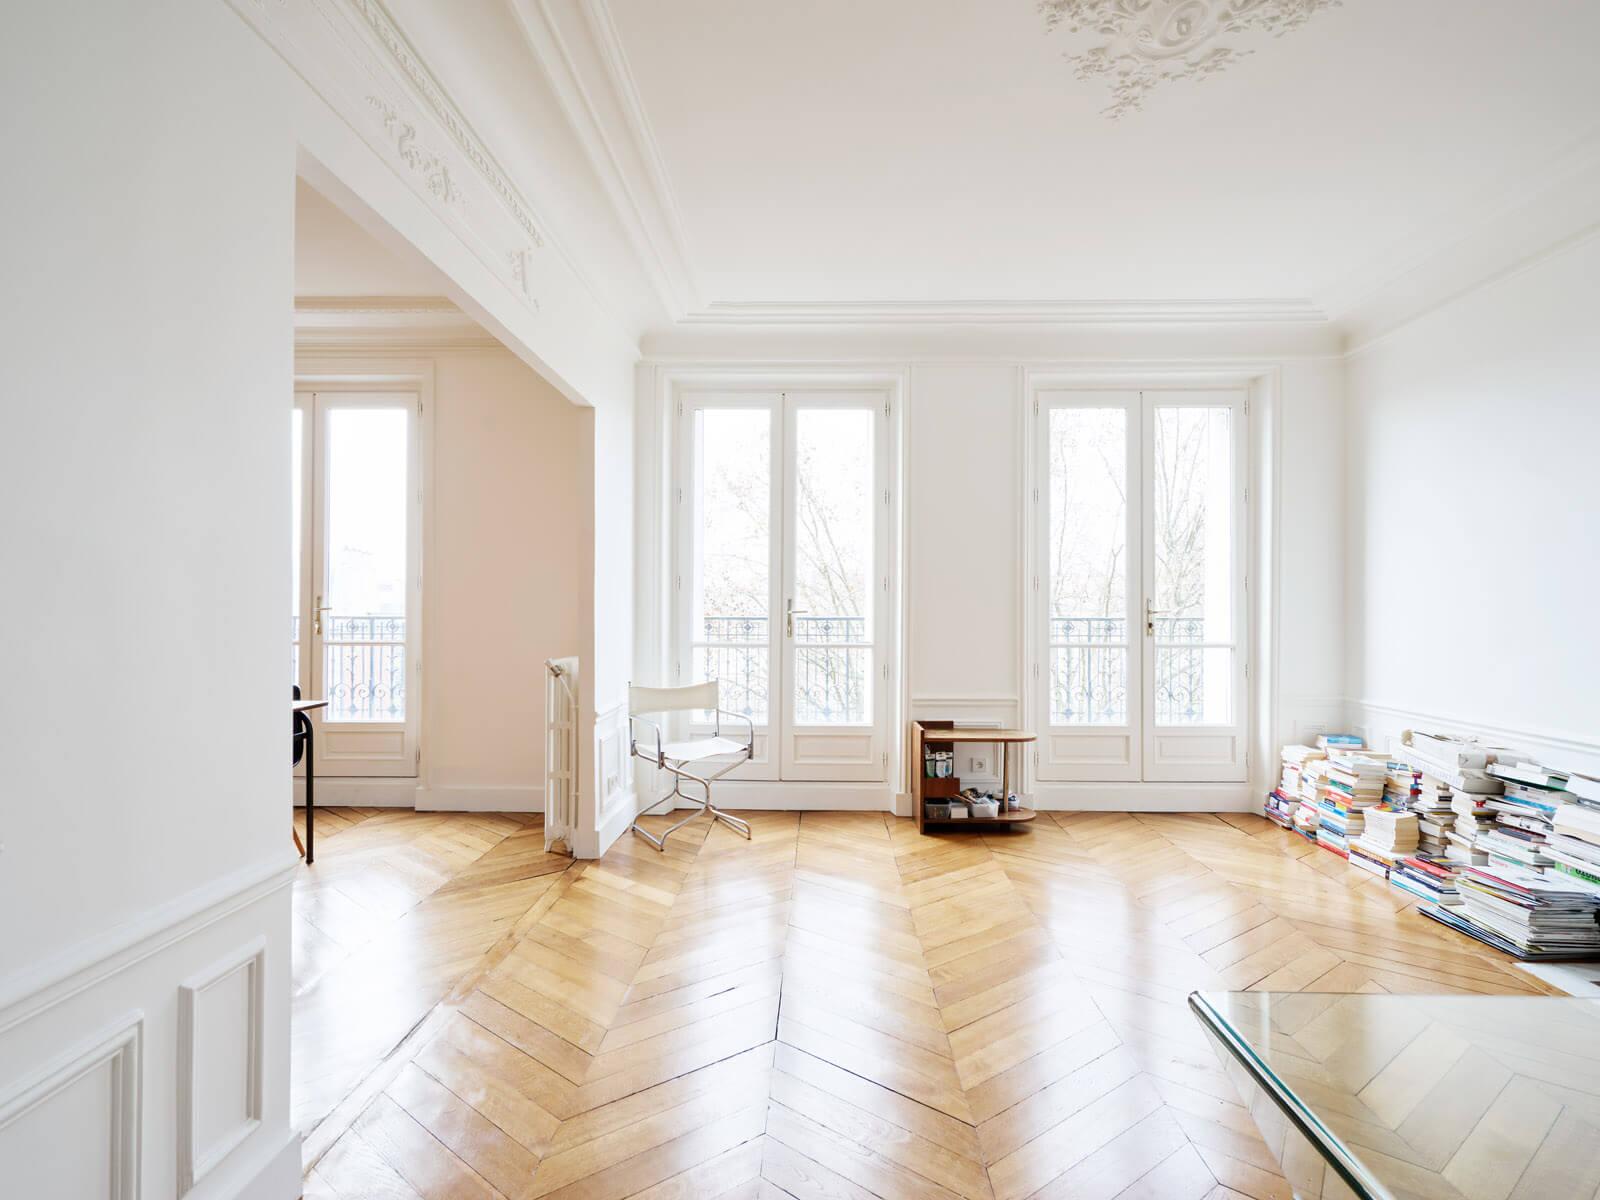 Rénover un appartement haussmannien